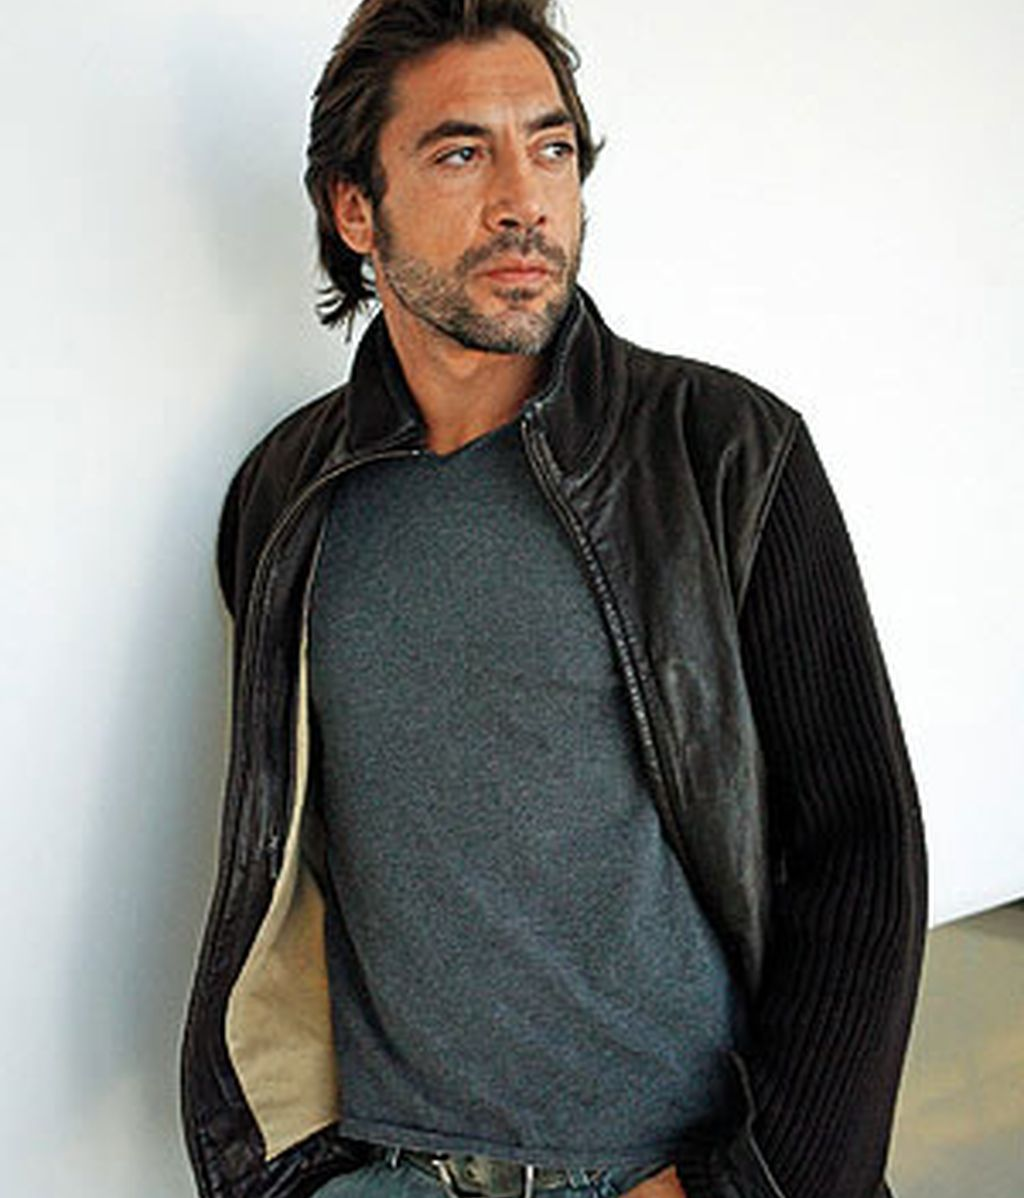 Javier Bardem (retrosexual)